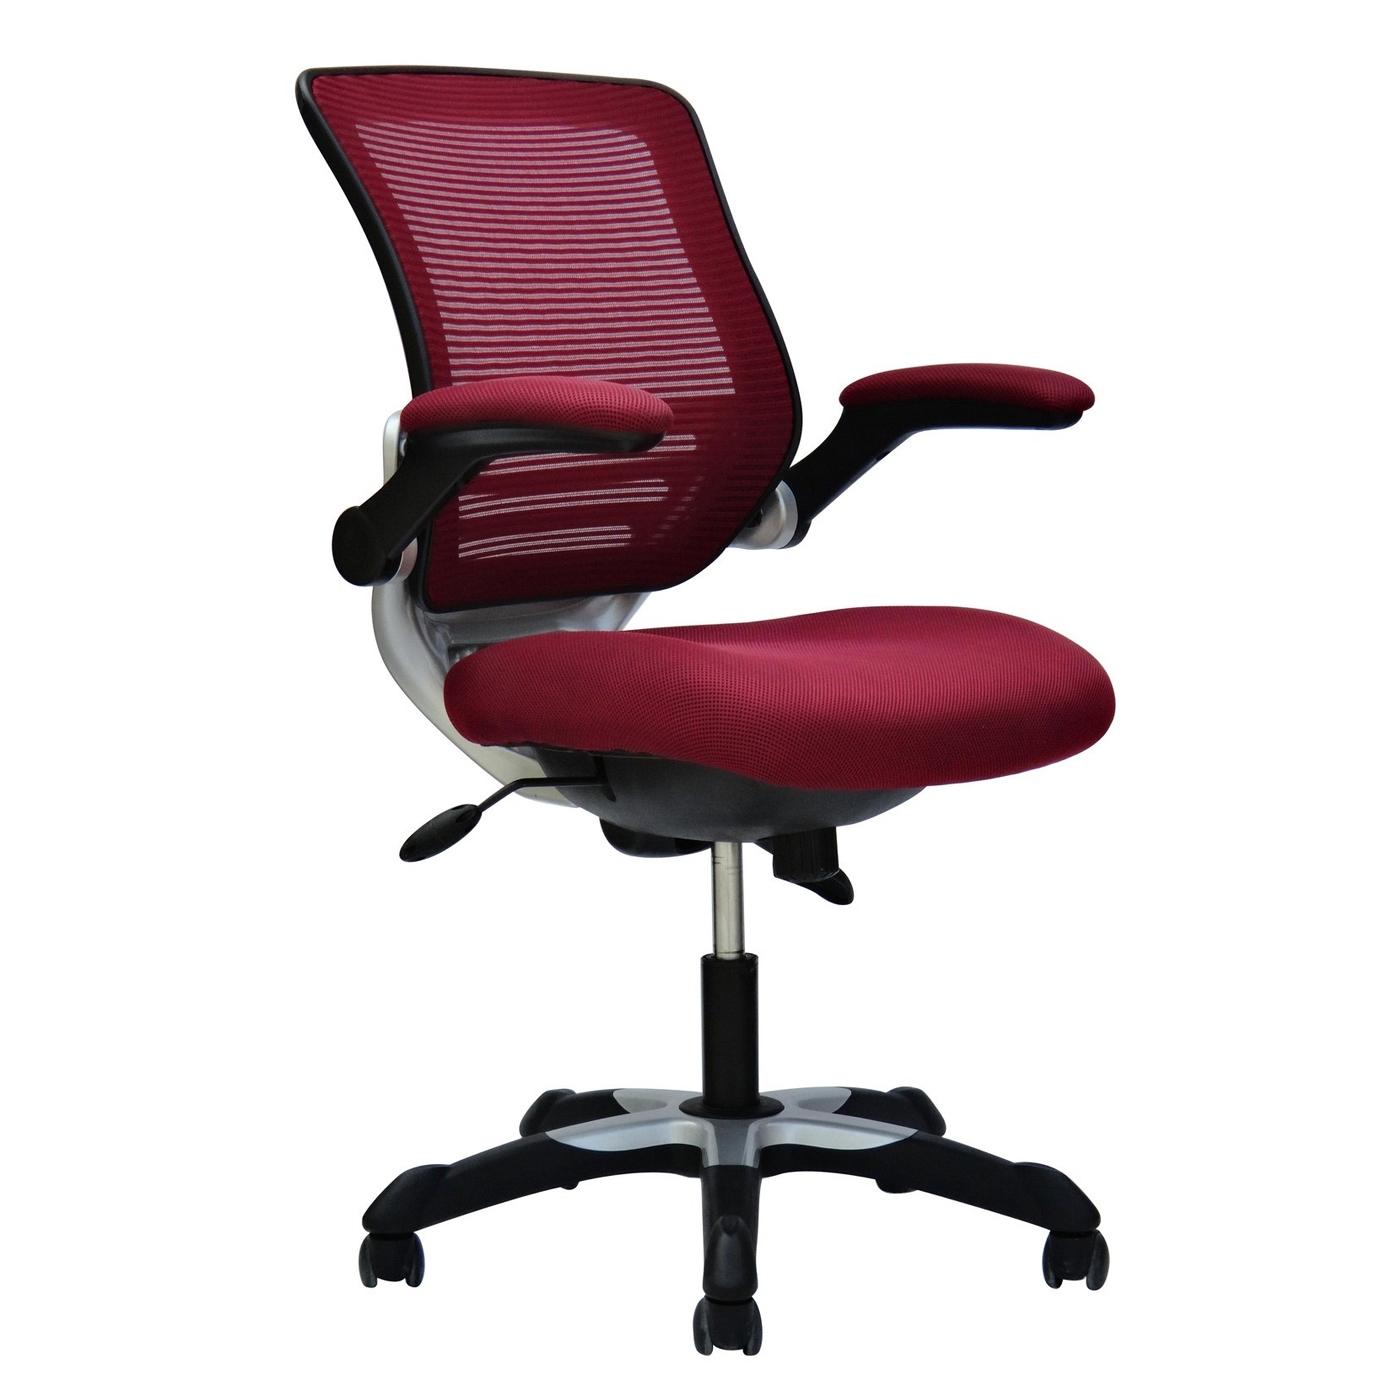 ergonomic computer chair desk for back pain adjustable office swivel